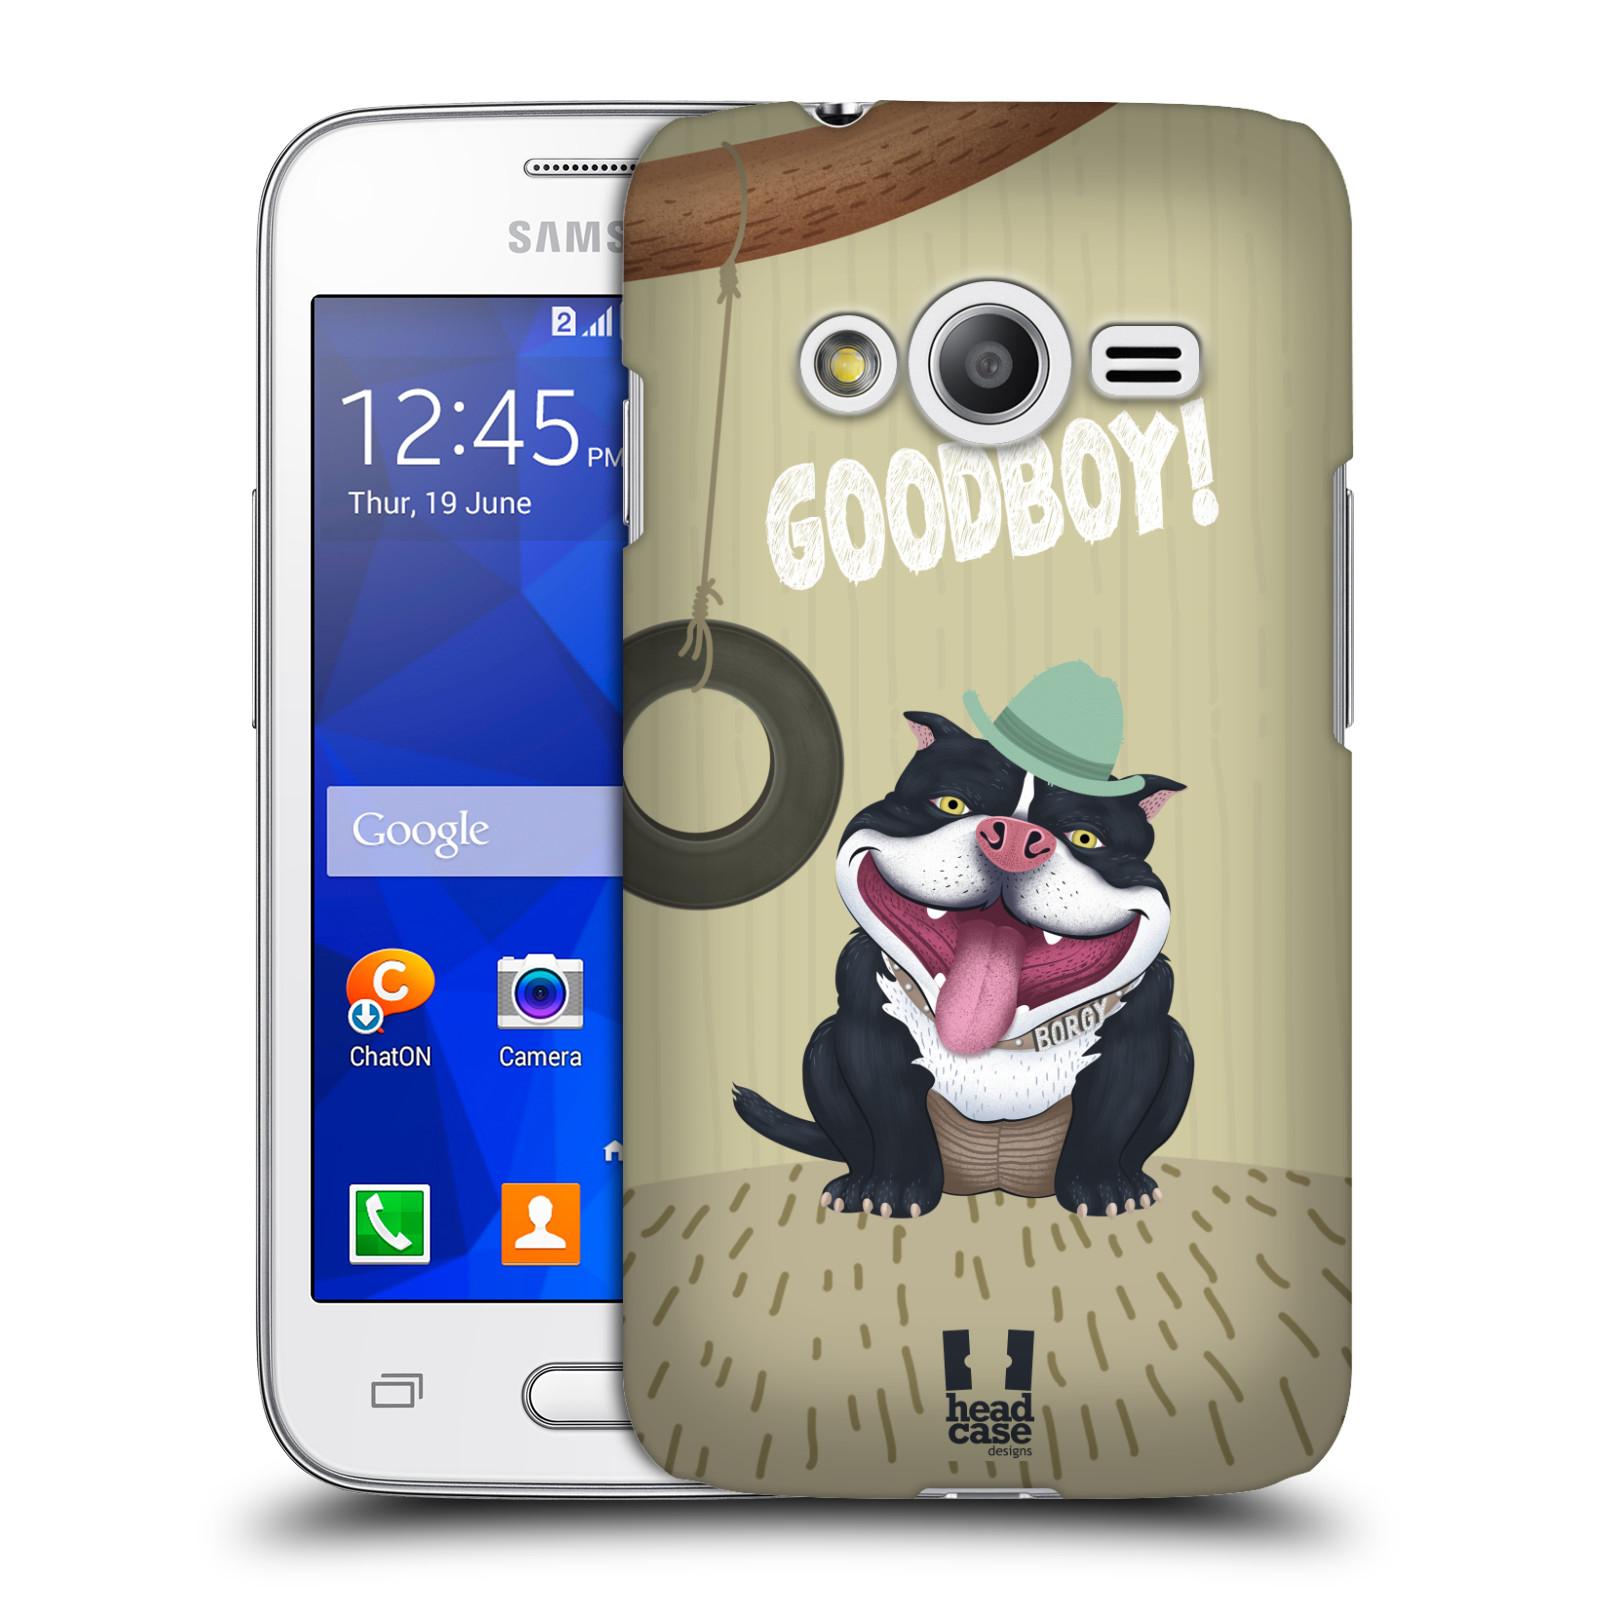 Plastové pouzdro na mobil Samsung Galaxy Trend 2 Lite HEAD CASE Goodboy! Pejsek (Kryt či obal na mobilní telefon Samsung Galaxy Trend 2 Lite SM-G318)